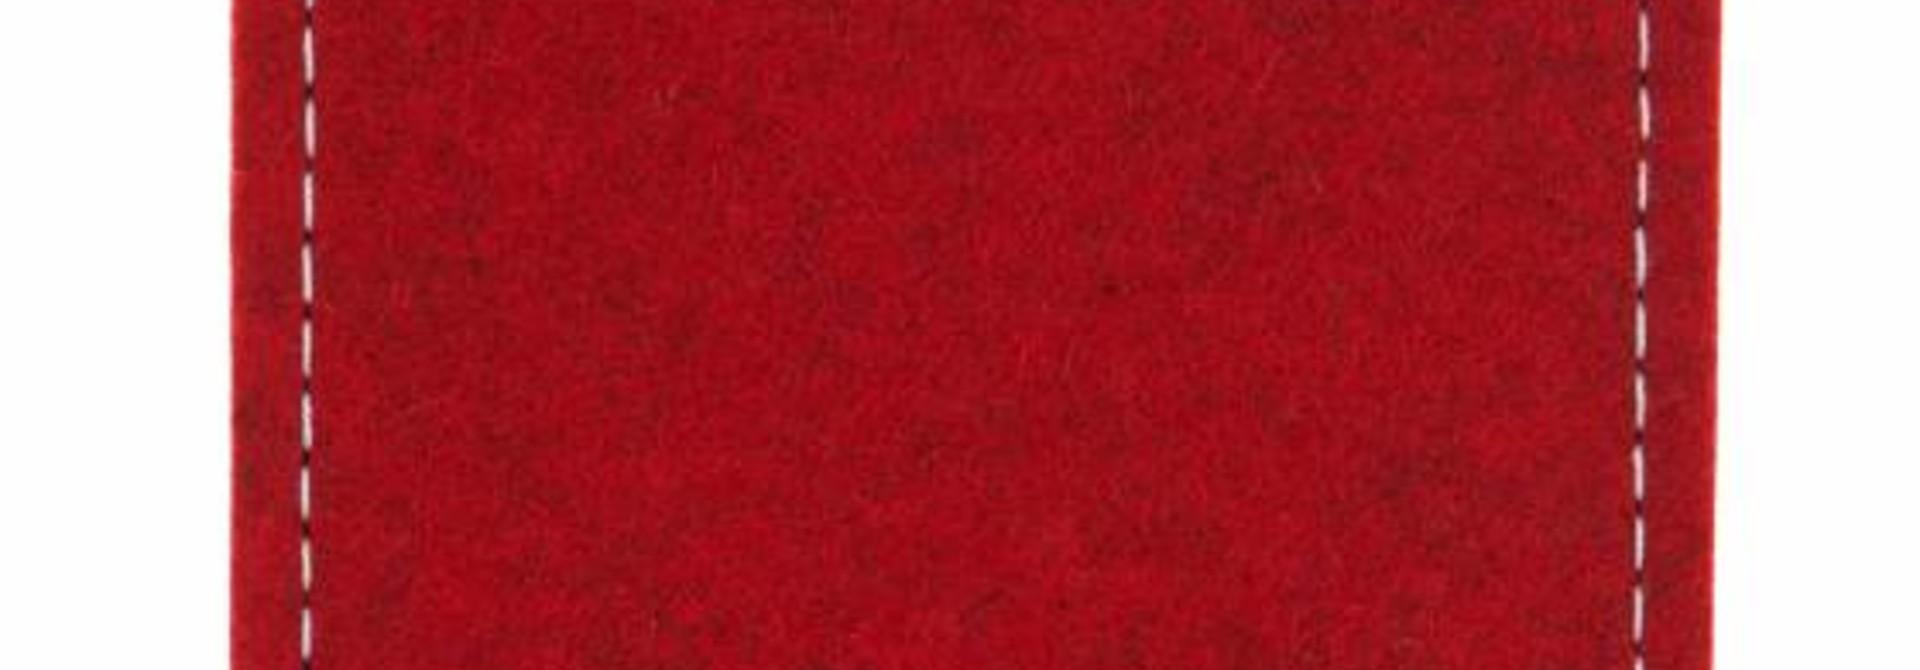 Mi / Redmi Sleeve Kirschrot